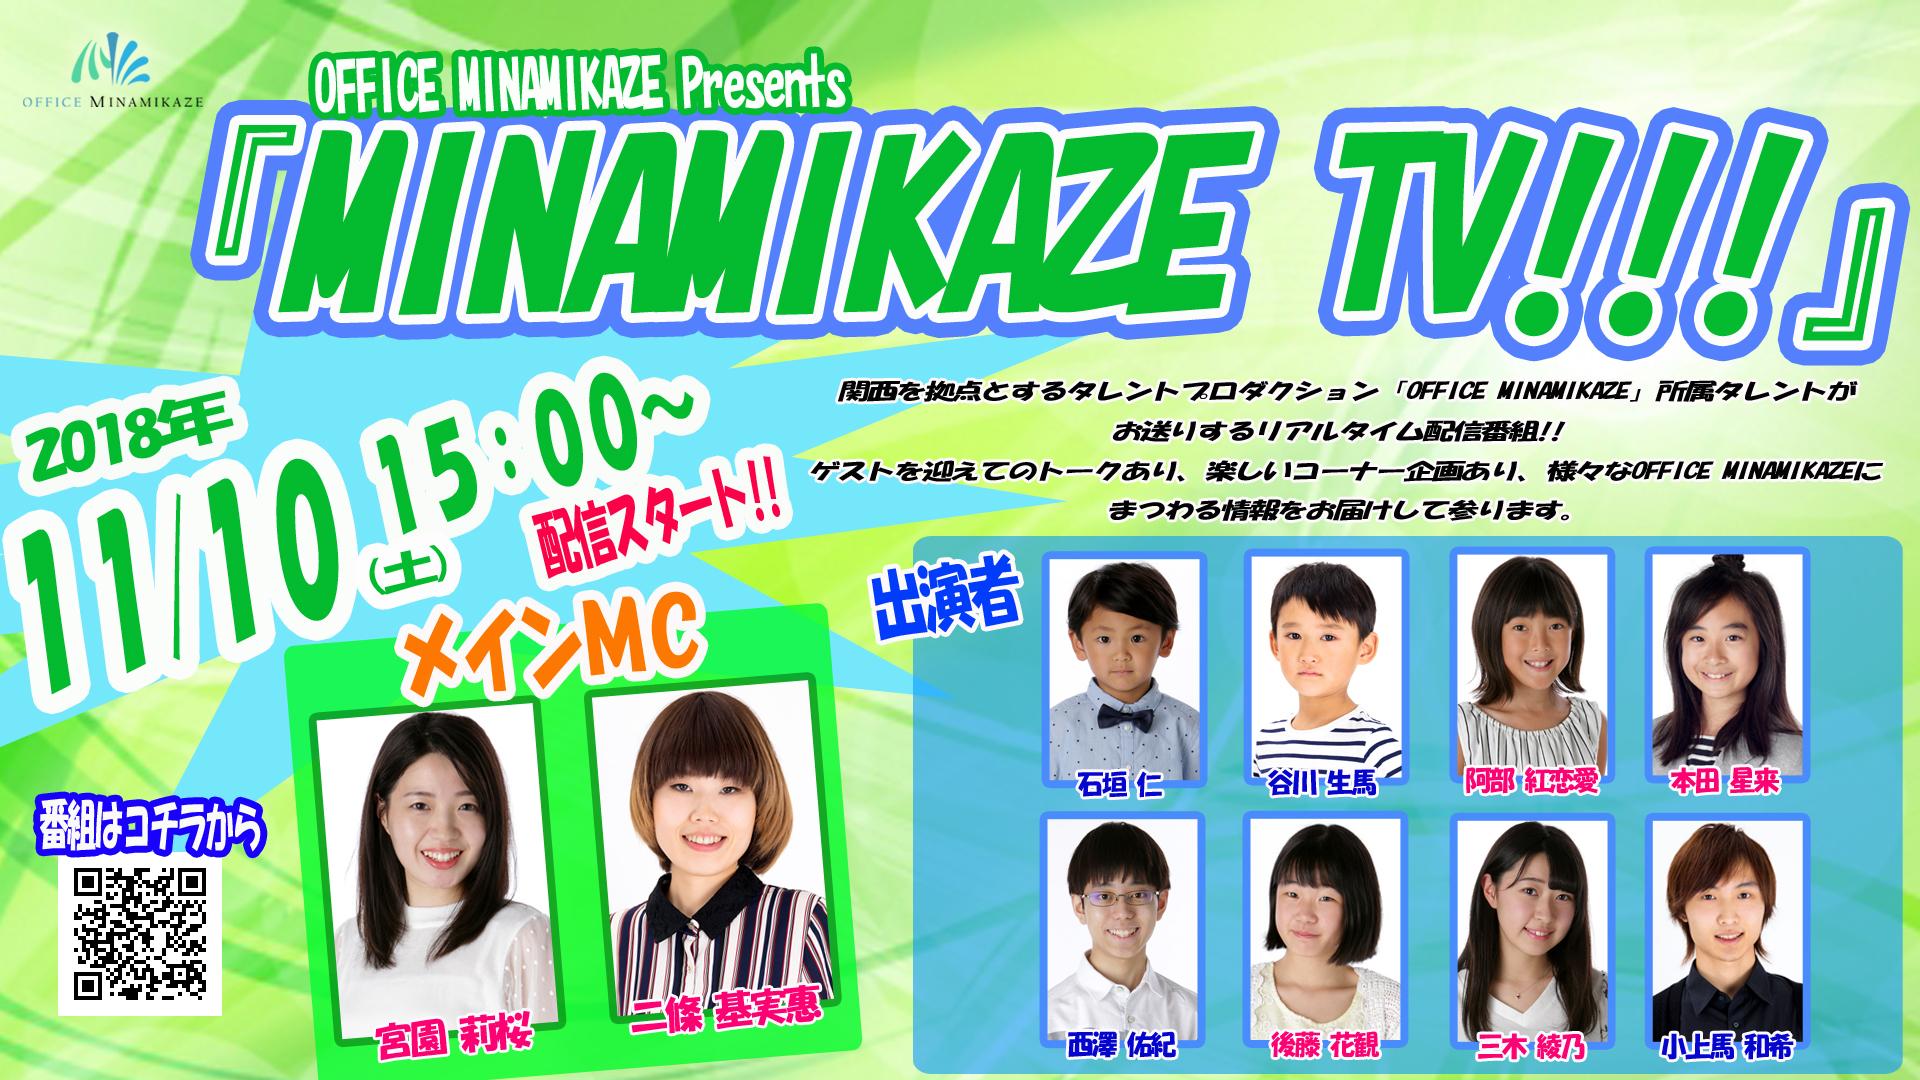 【出演情報】2018年11月10日(土)OFFICE MINAMIKAZE Presents by FRESH!「MINAMIKAZE TV!!!」